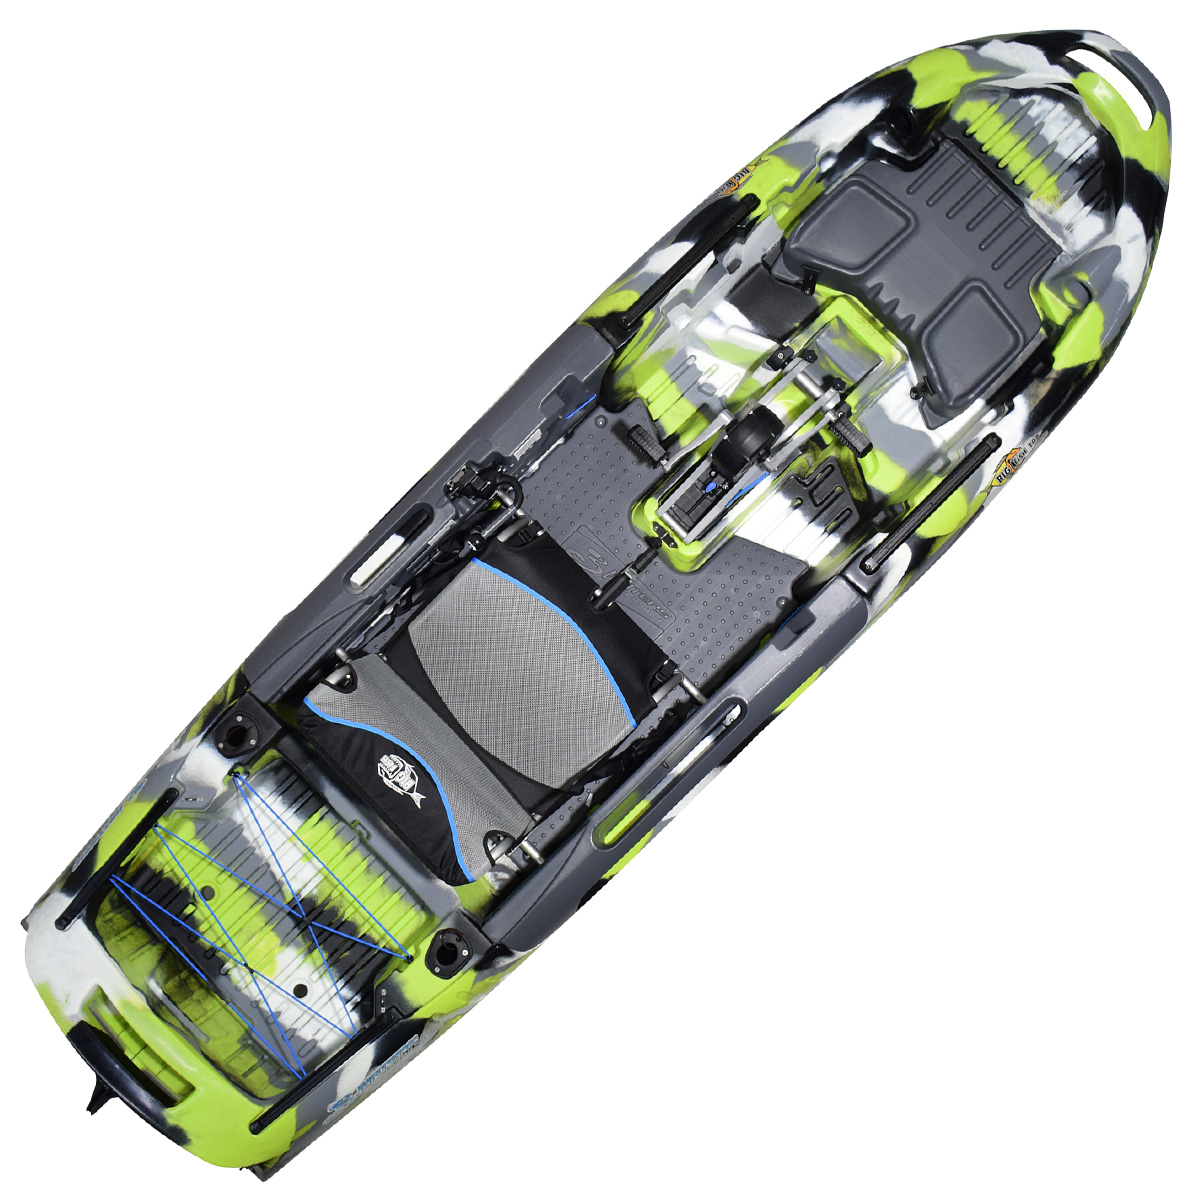 3 Waters Big Fish 108 Pedal Kayak Green Camo